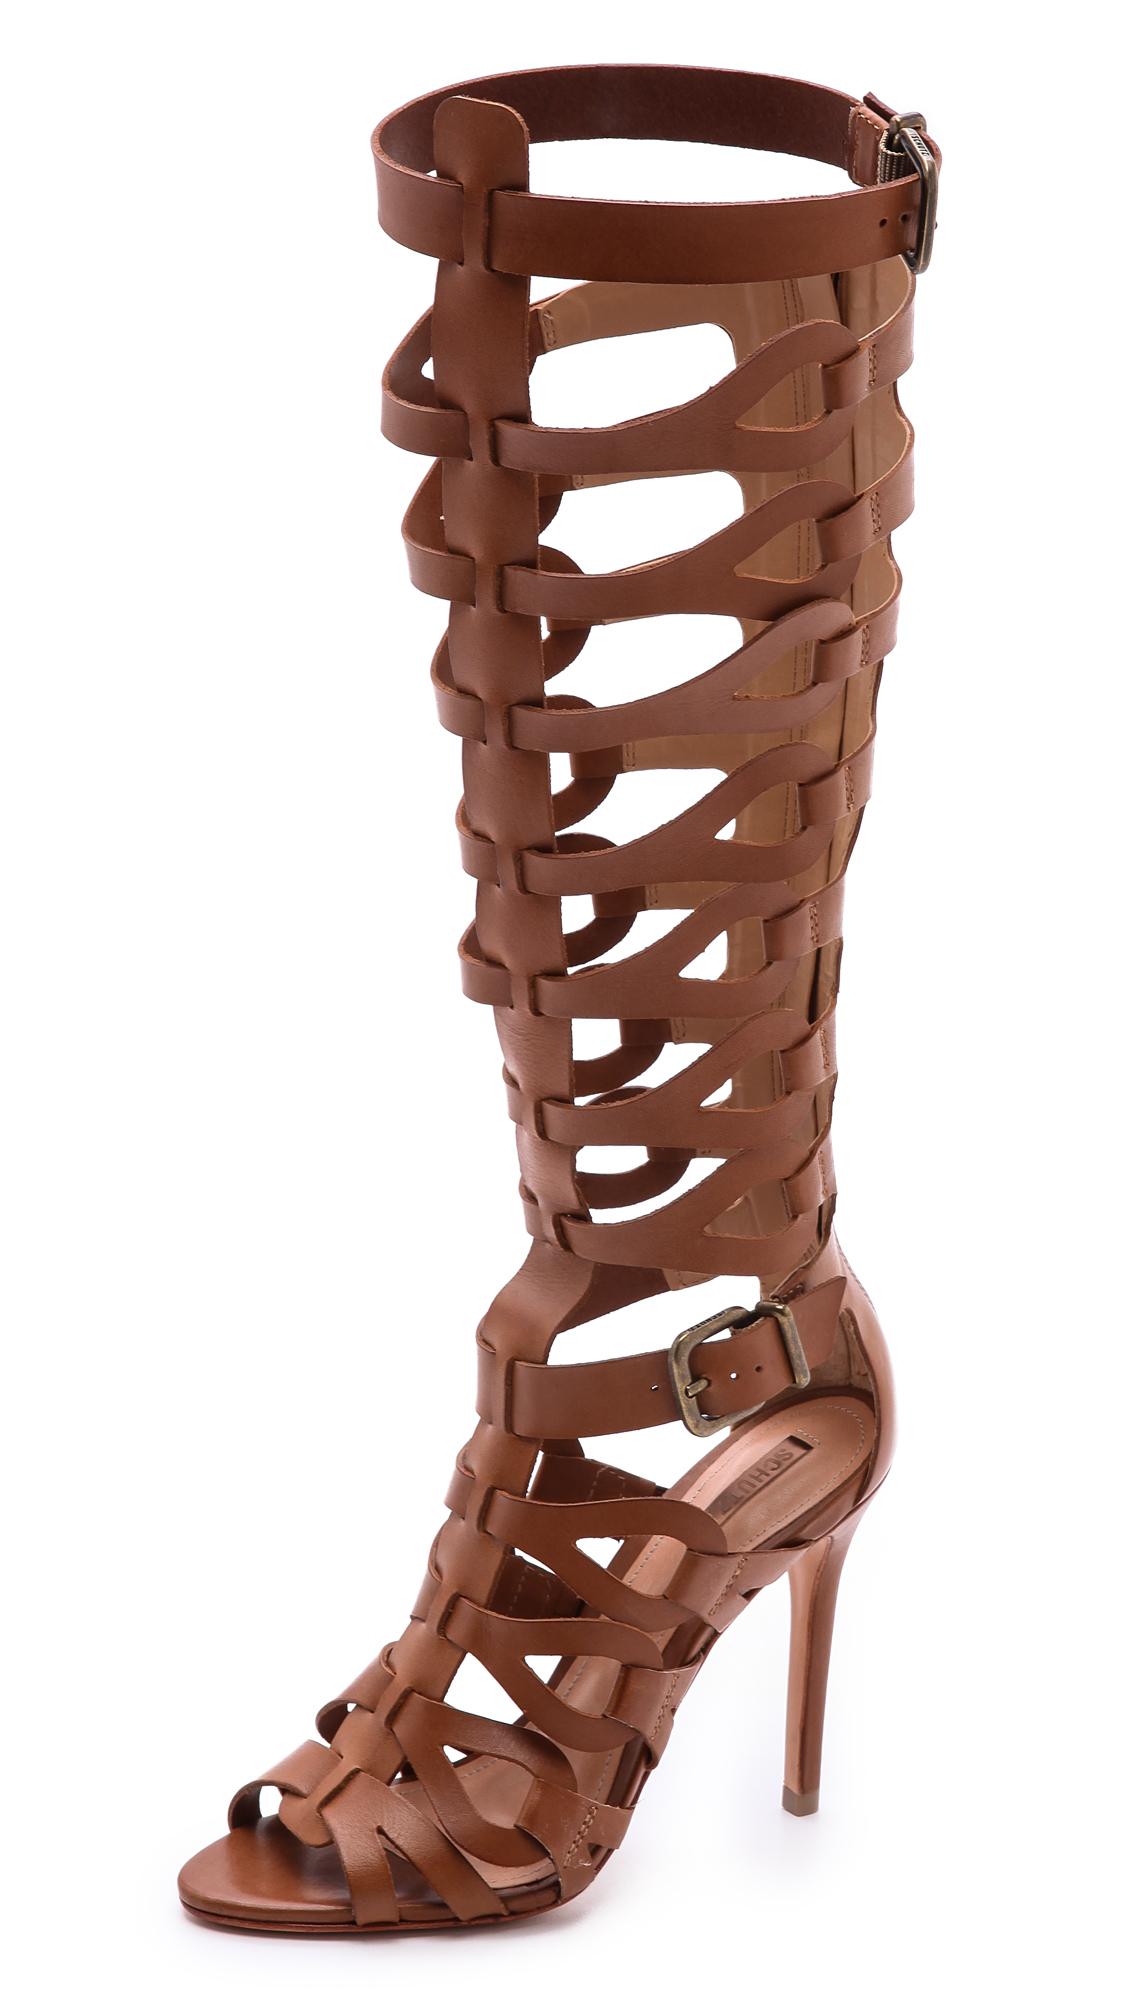 Lyst Schutz Eirini Cutout Tall Gladiator Sandals In Brown